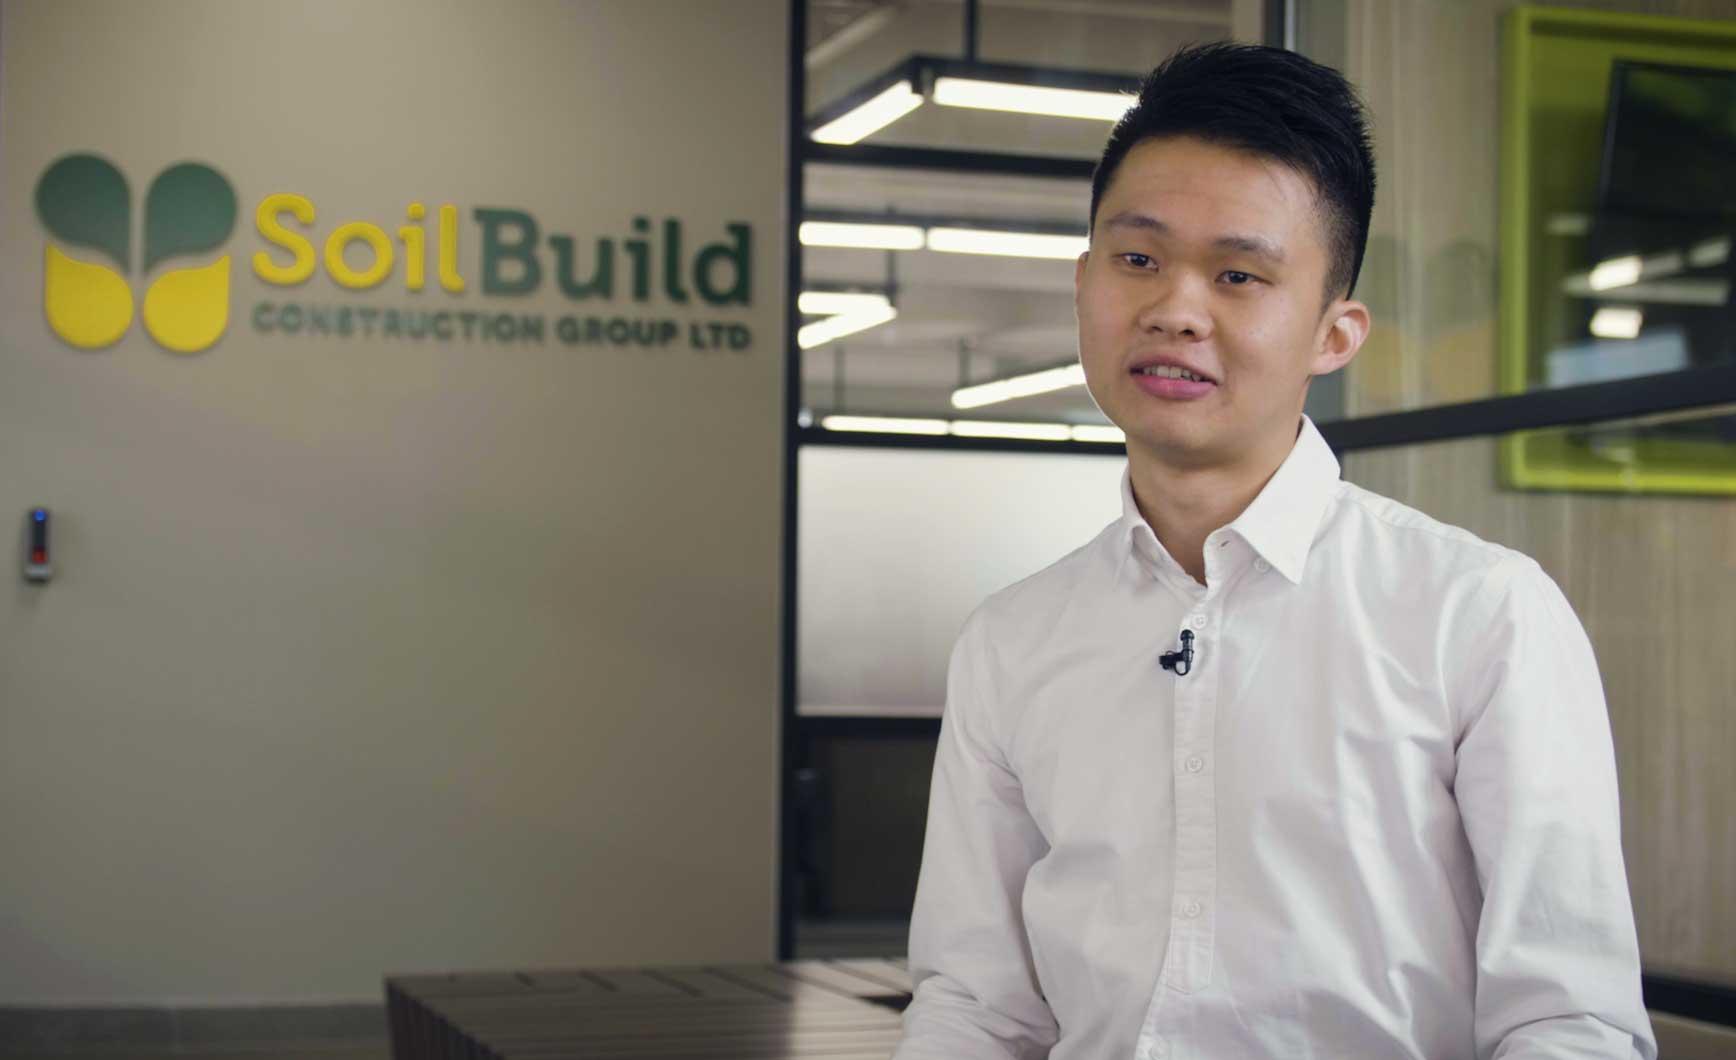 Mr Daryl Chew, Planning Engineer, Precast, Soilbuild Construction Group Ltd.